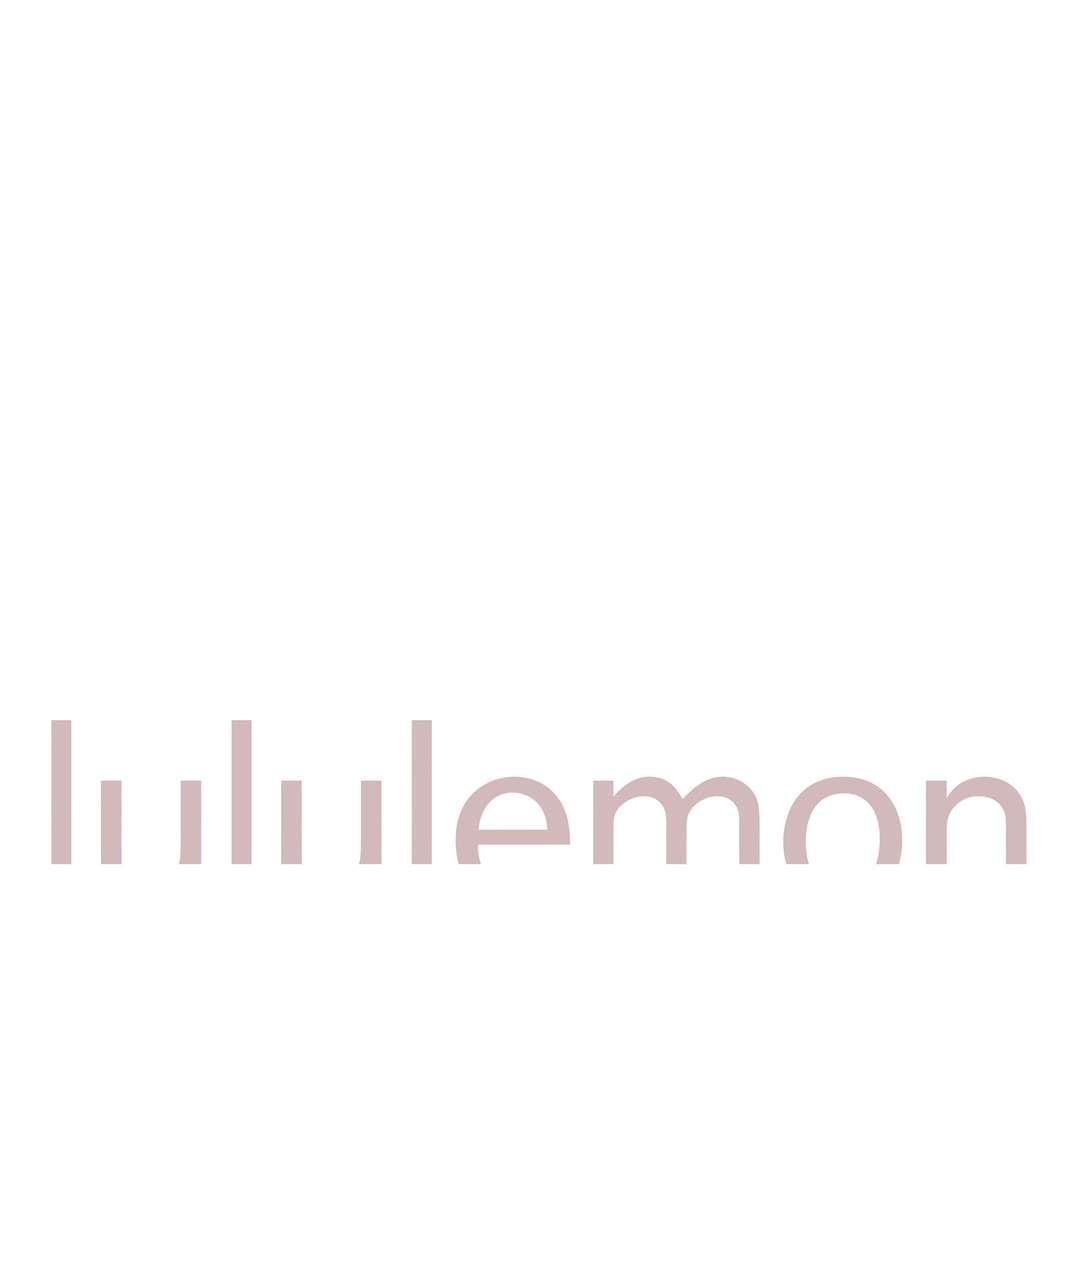 Lululemon Purist Cycling Water Bottle *26 oz - Purist Cortes Misty Pink